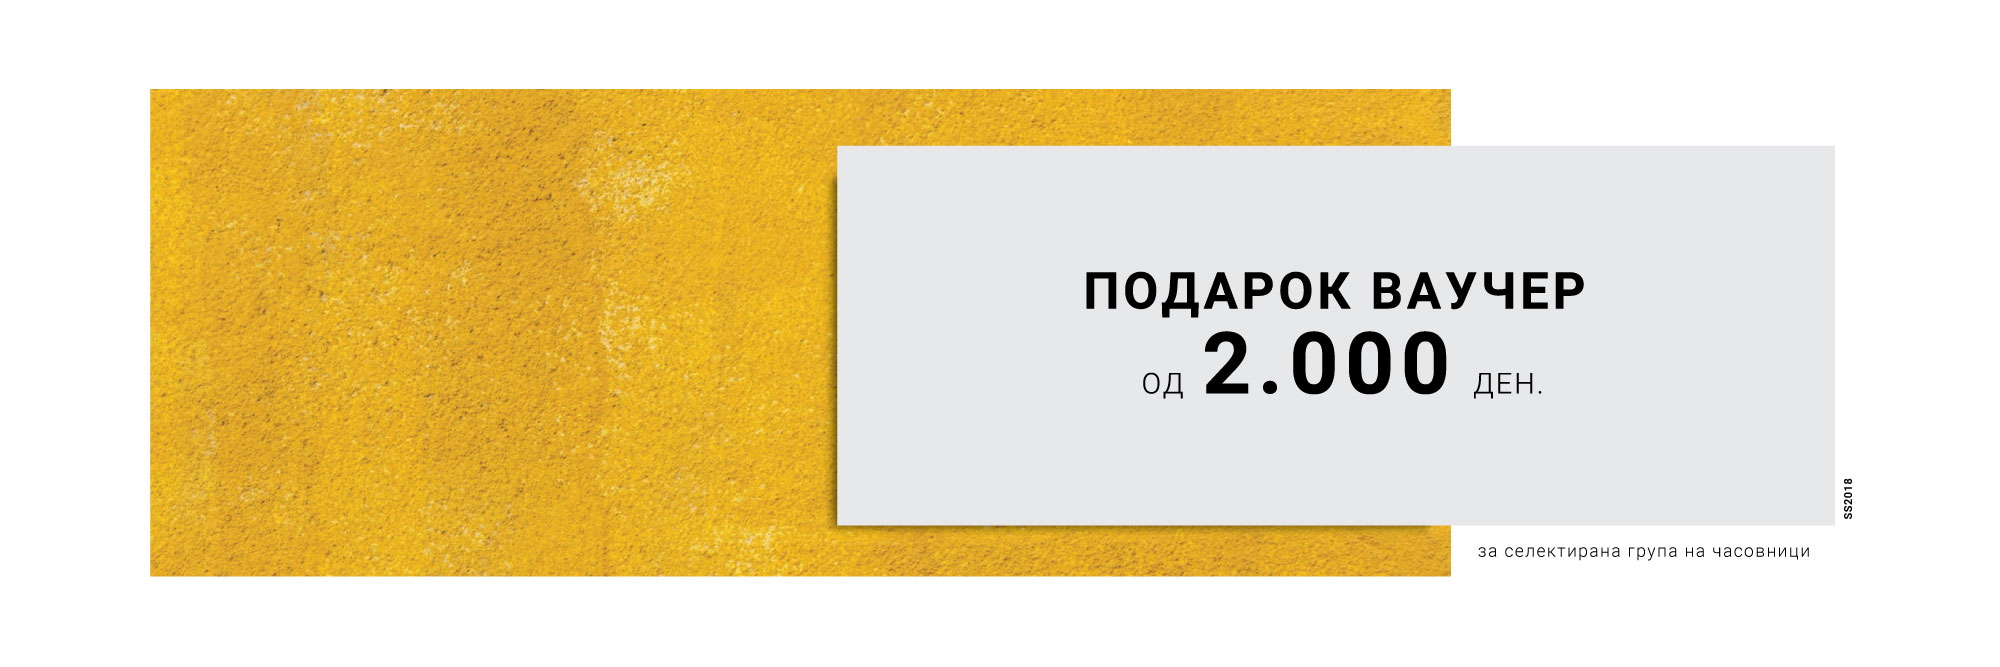 Ваучер 2000 ден